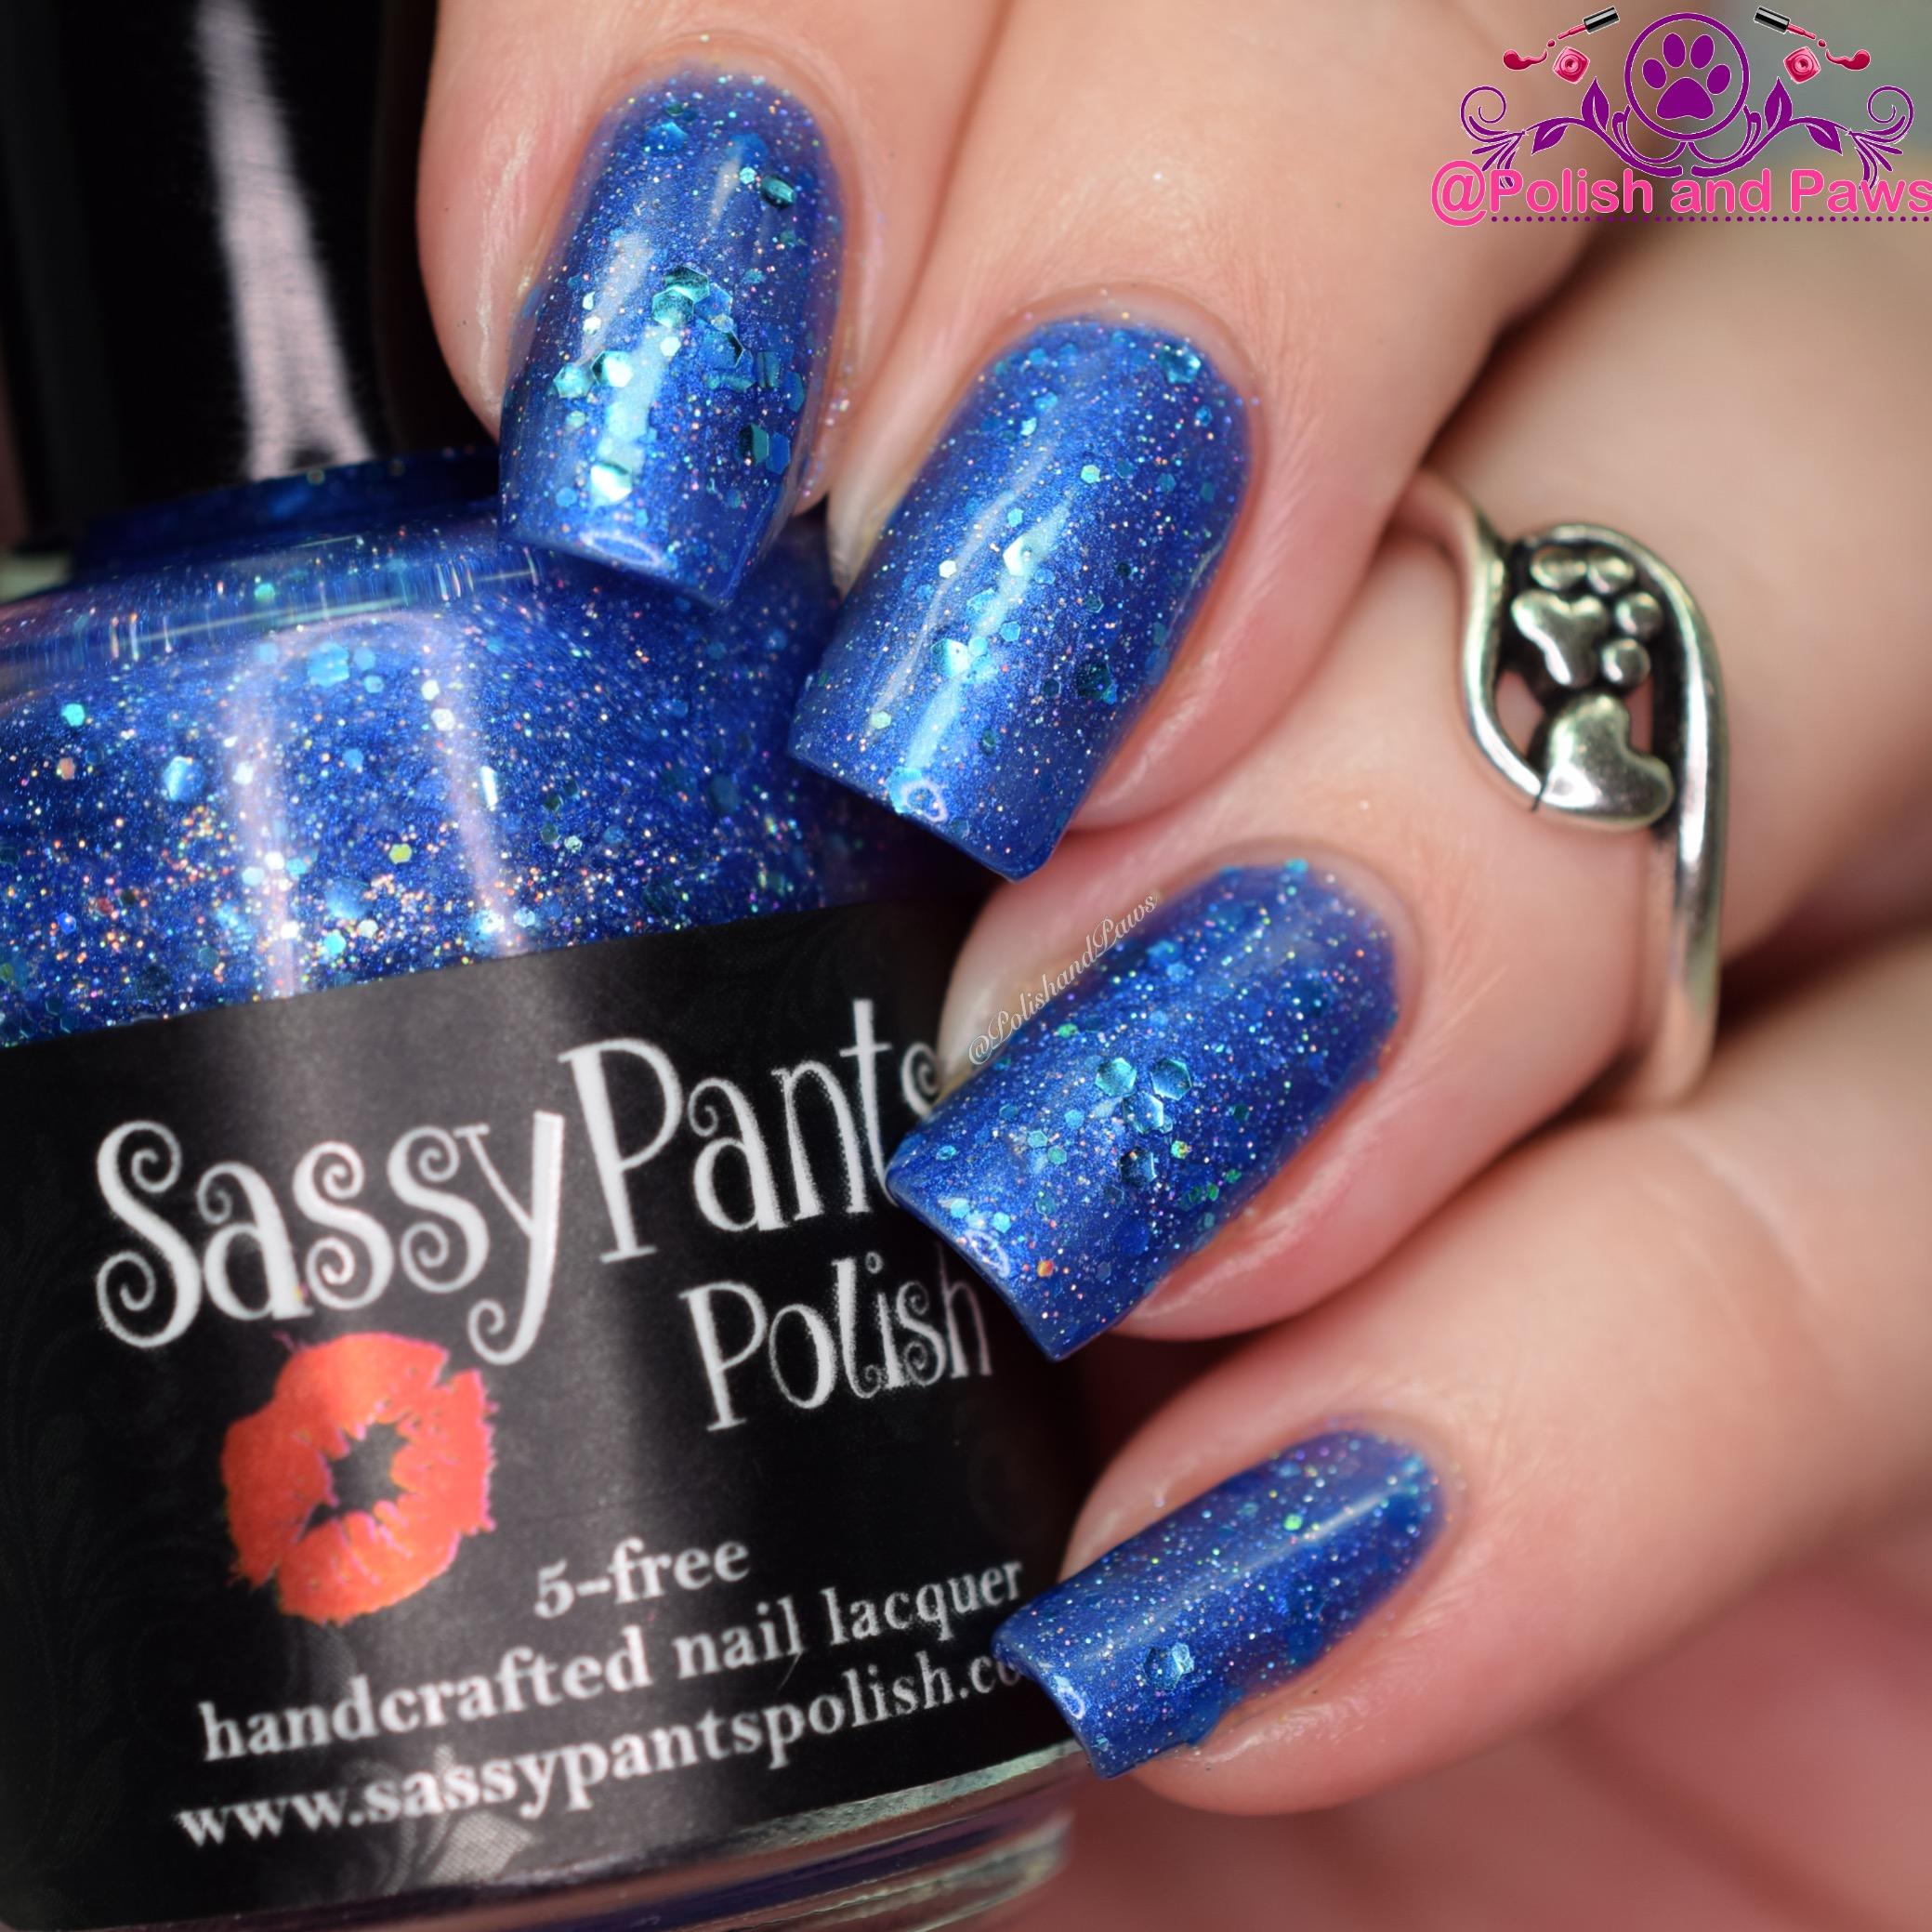 Sassy Pants Polish Blueberry Balls